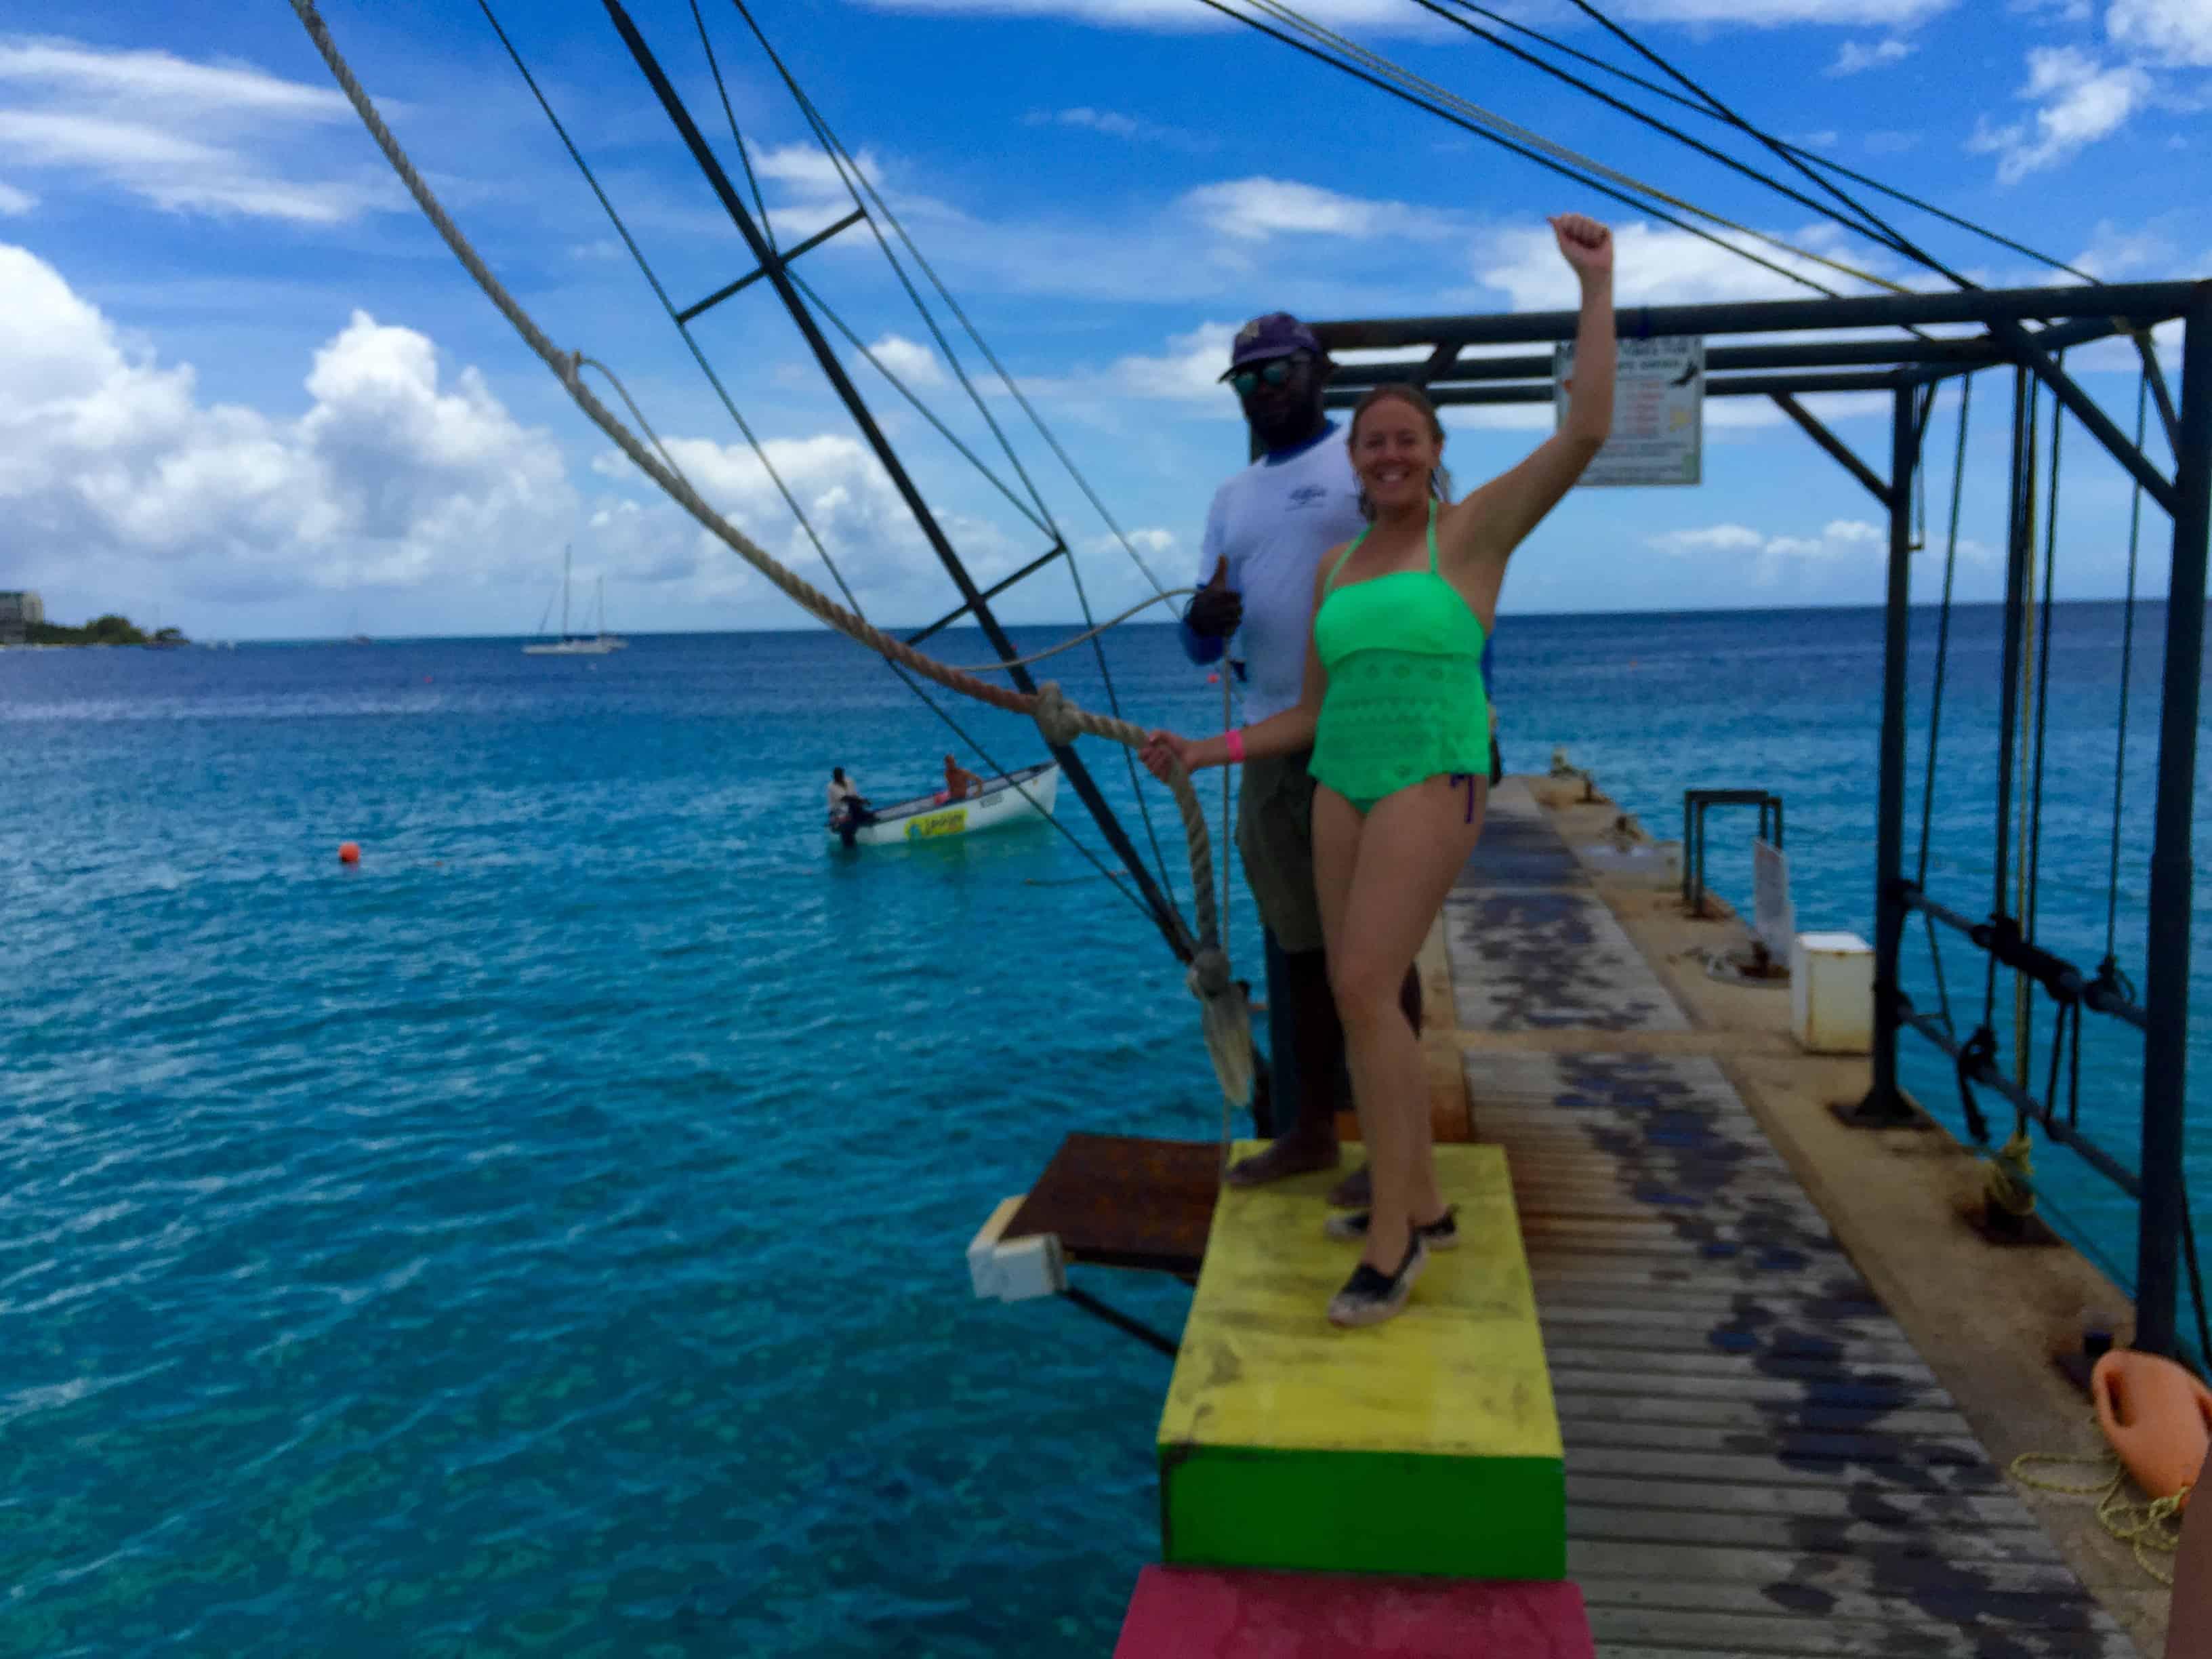 Beach Day in Barbados by Tastefulventure.com